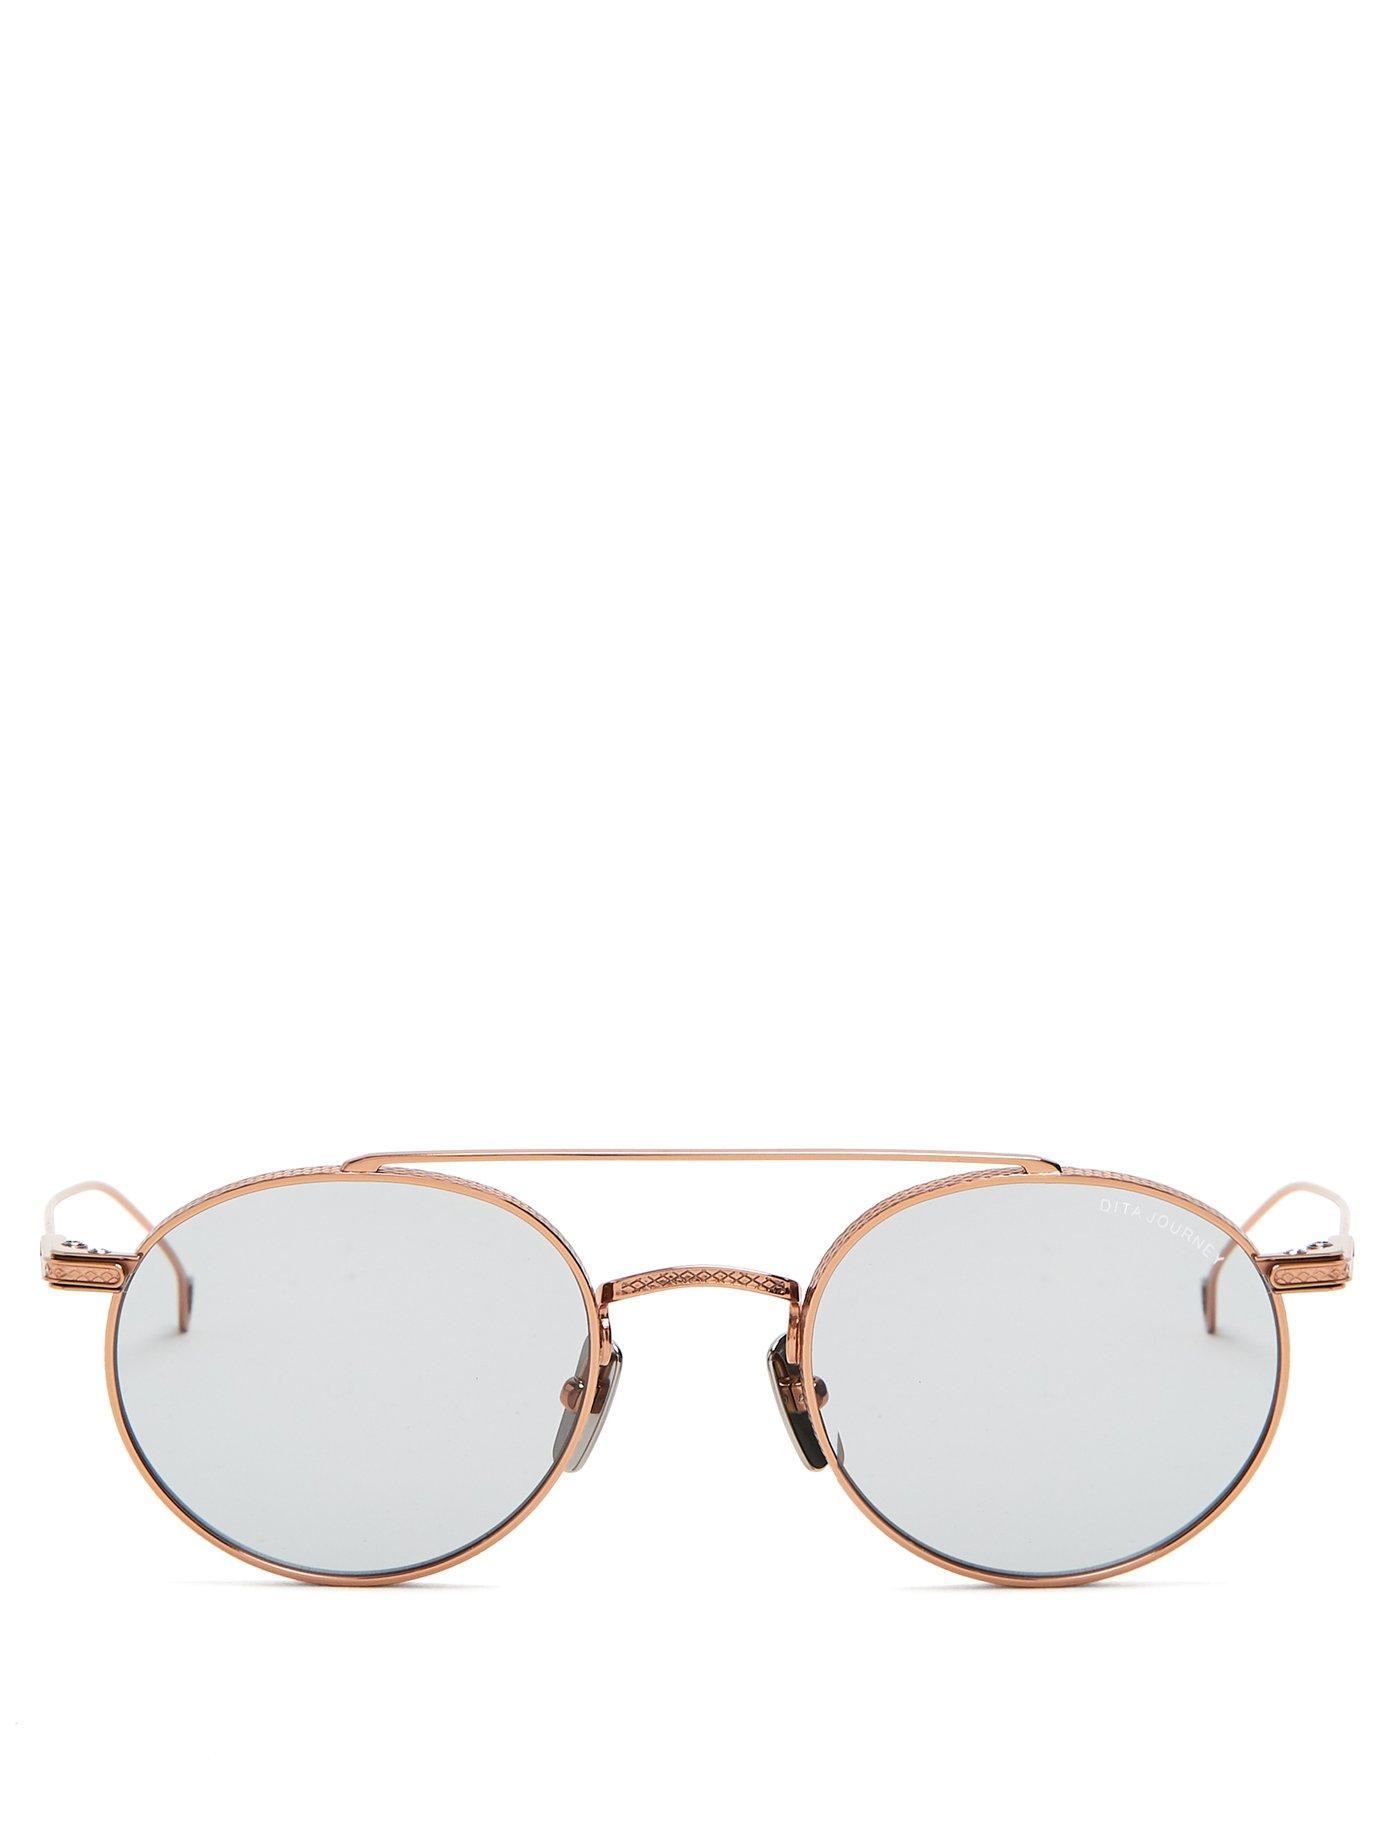 62902d6ca99bf Dita Eyewear Journey Round Titanium Sunglasses In Gold